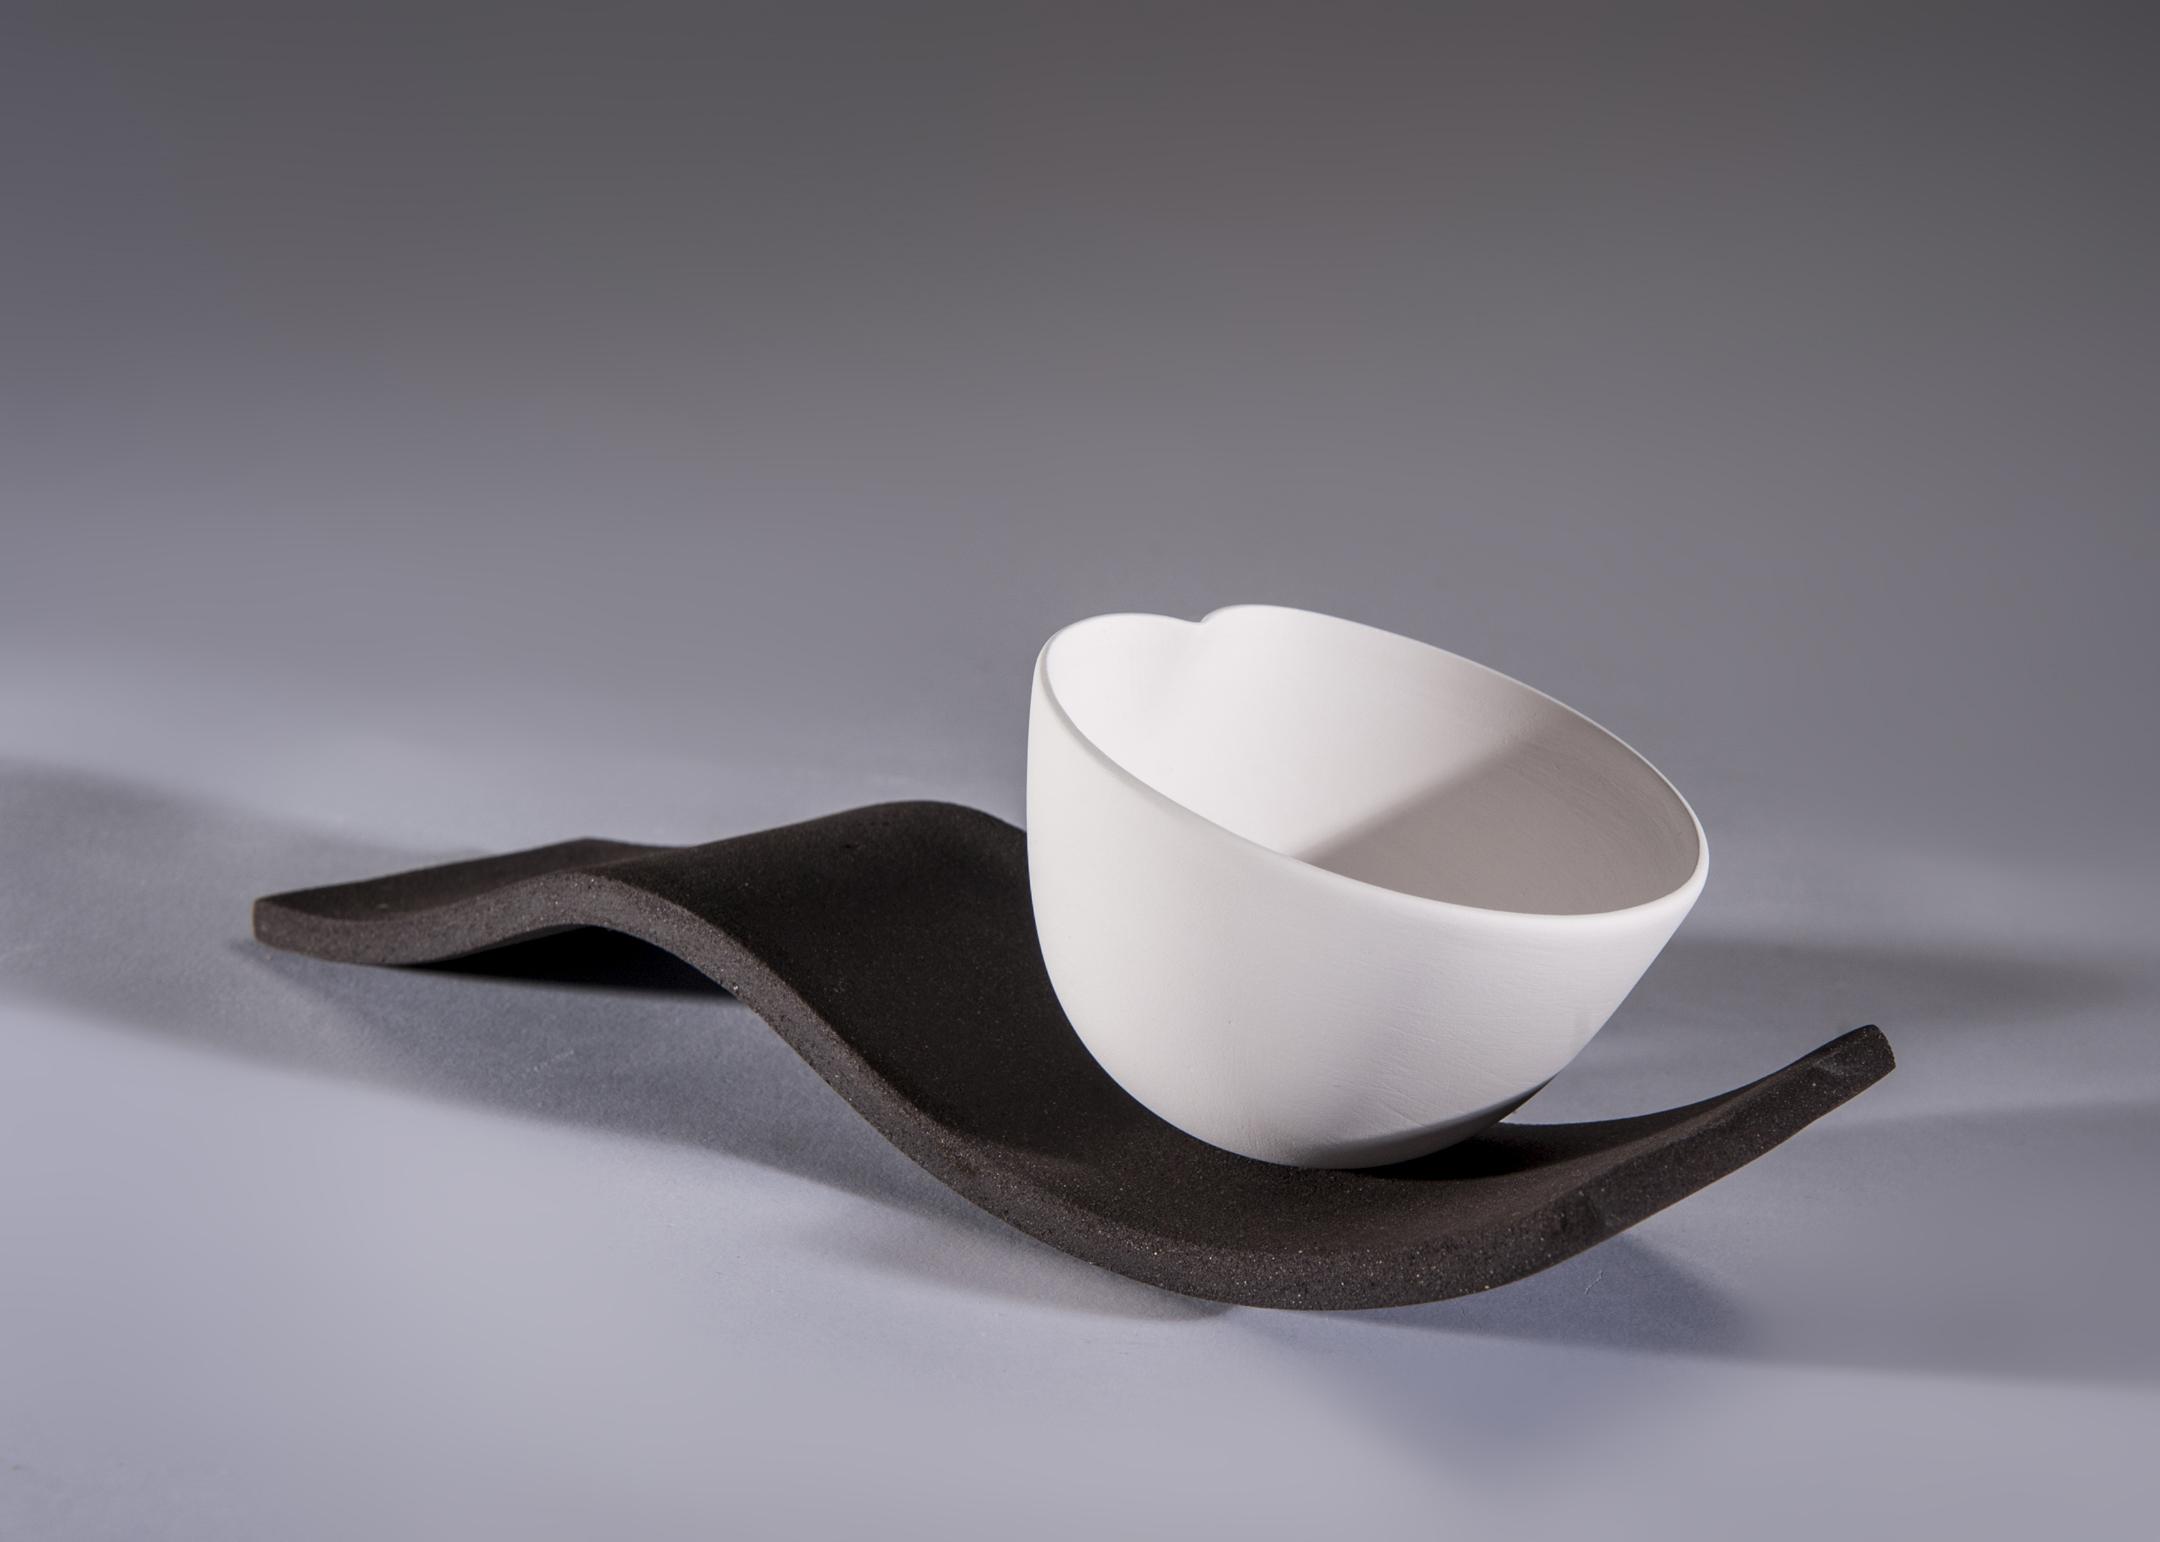 2. Sasha McVey- Little Dip- porcelain and black clay- 31cm x 11cm x 11cm- 2013.jpg